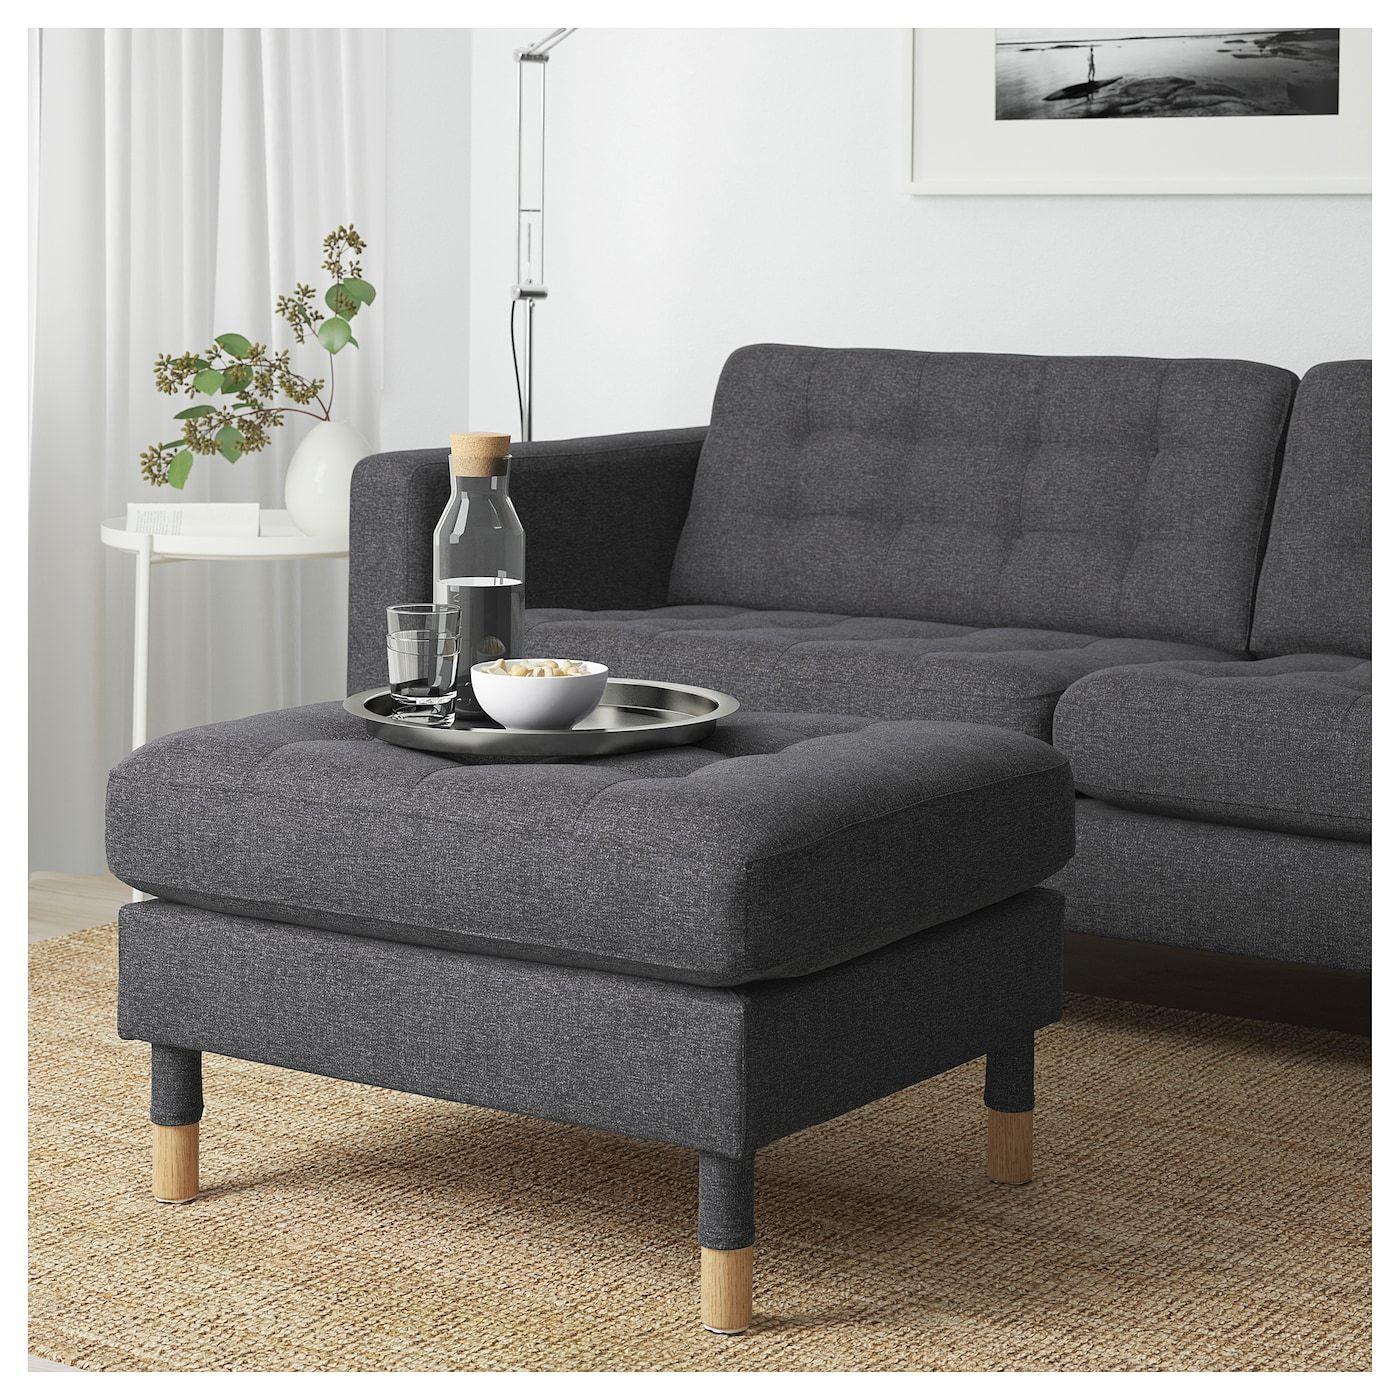 Ikea Us Furniture And Home Furnishings Ikea Landskrona Landskrona Ikea